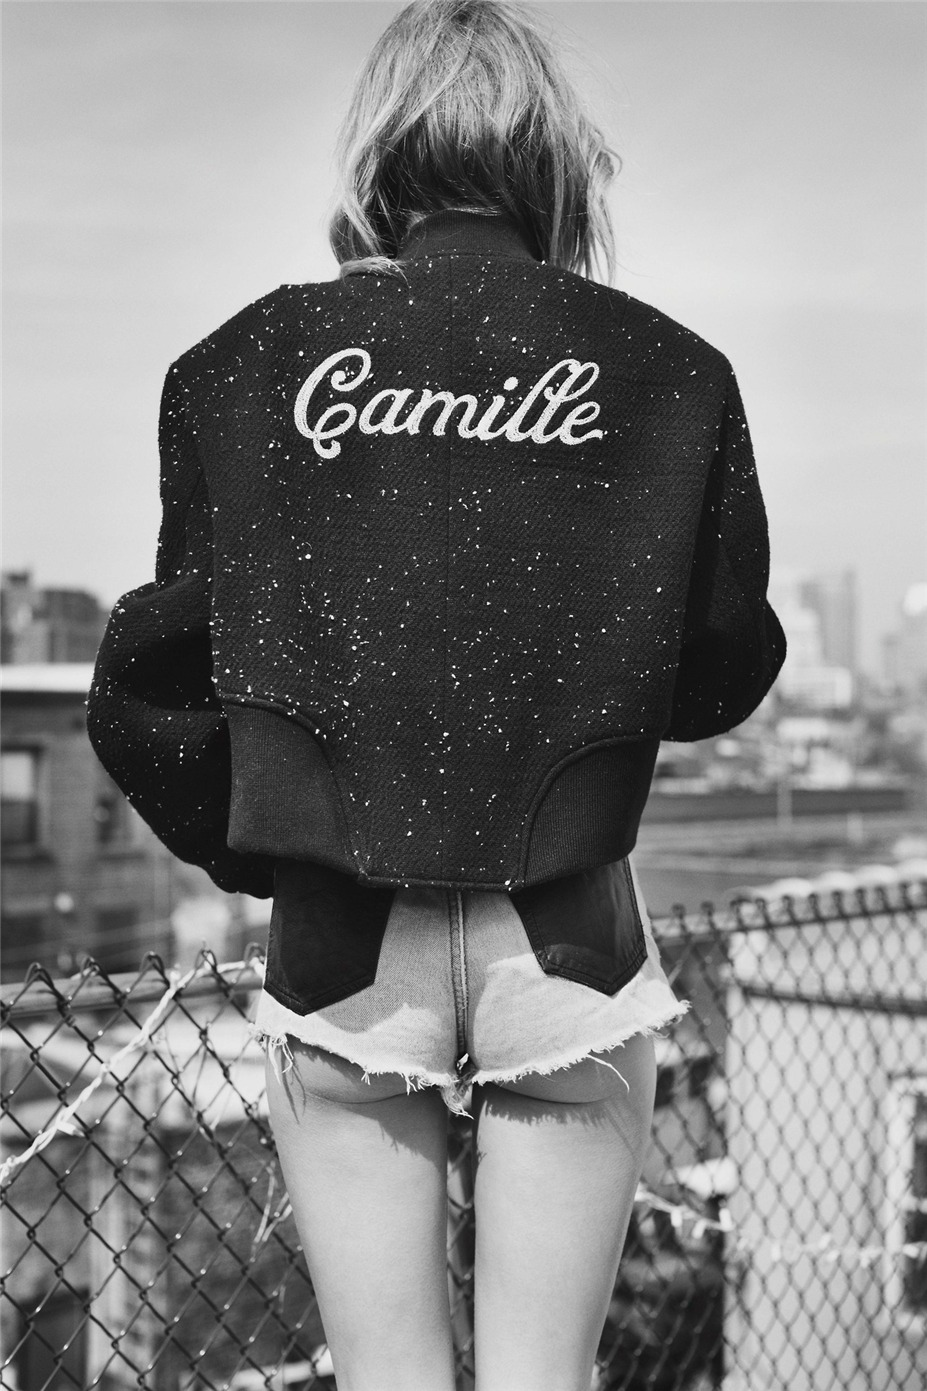 Камиль Роу / Camille Rowe by Guy Aroch